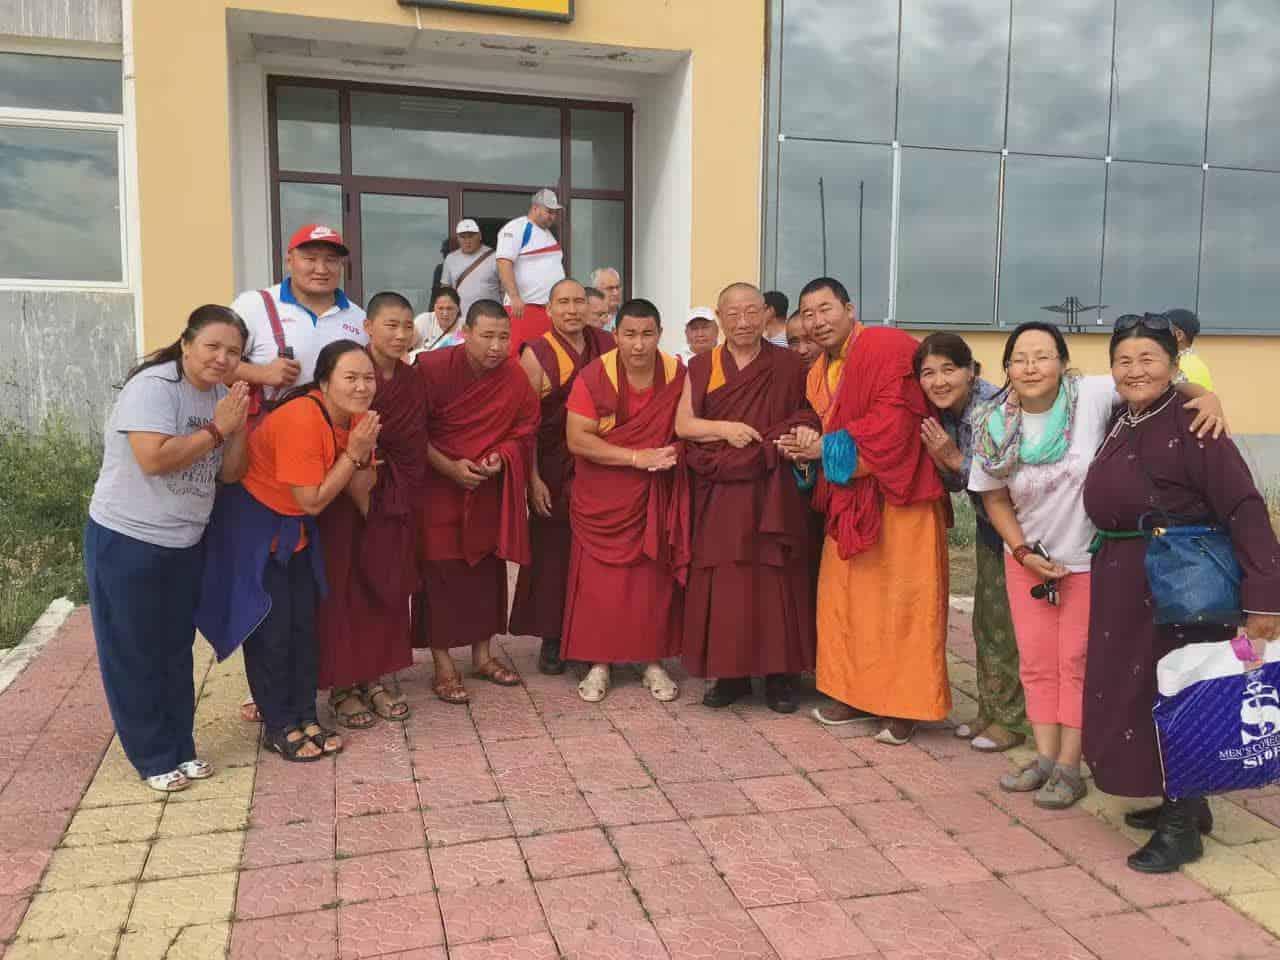 gosok-rinpoche-mongolia-2016-1f99ffad00007597d9385b0be2a9cfd